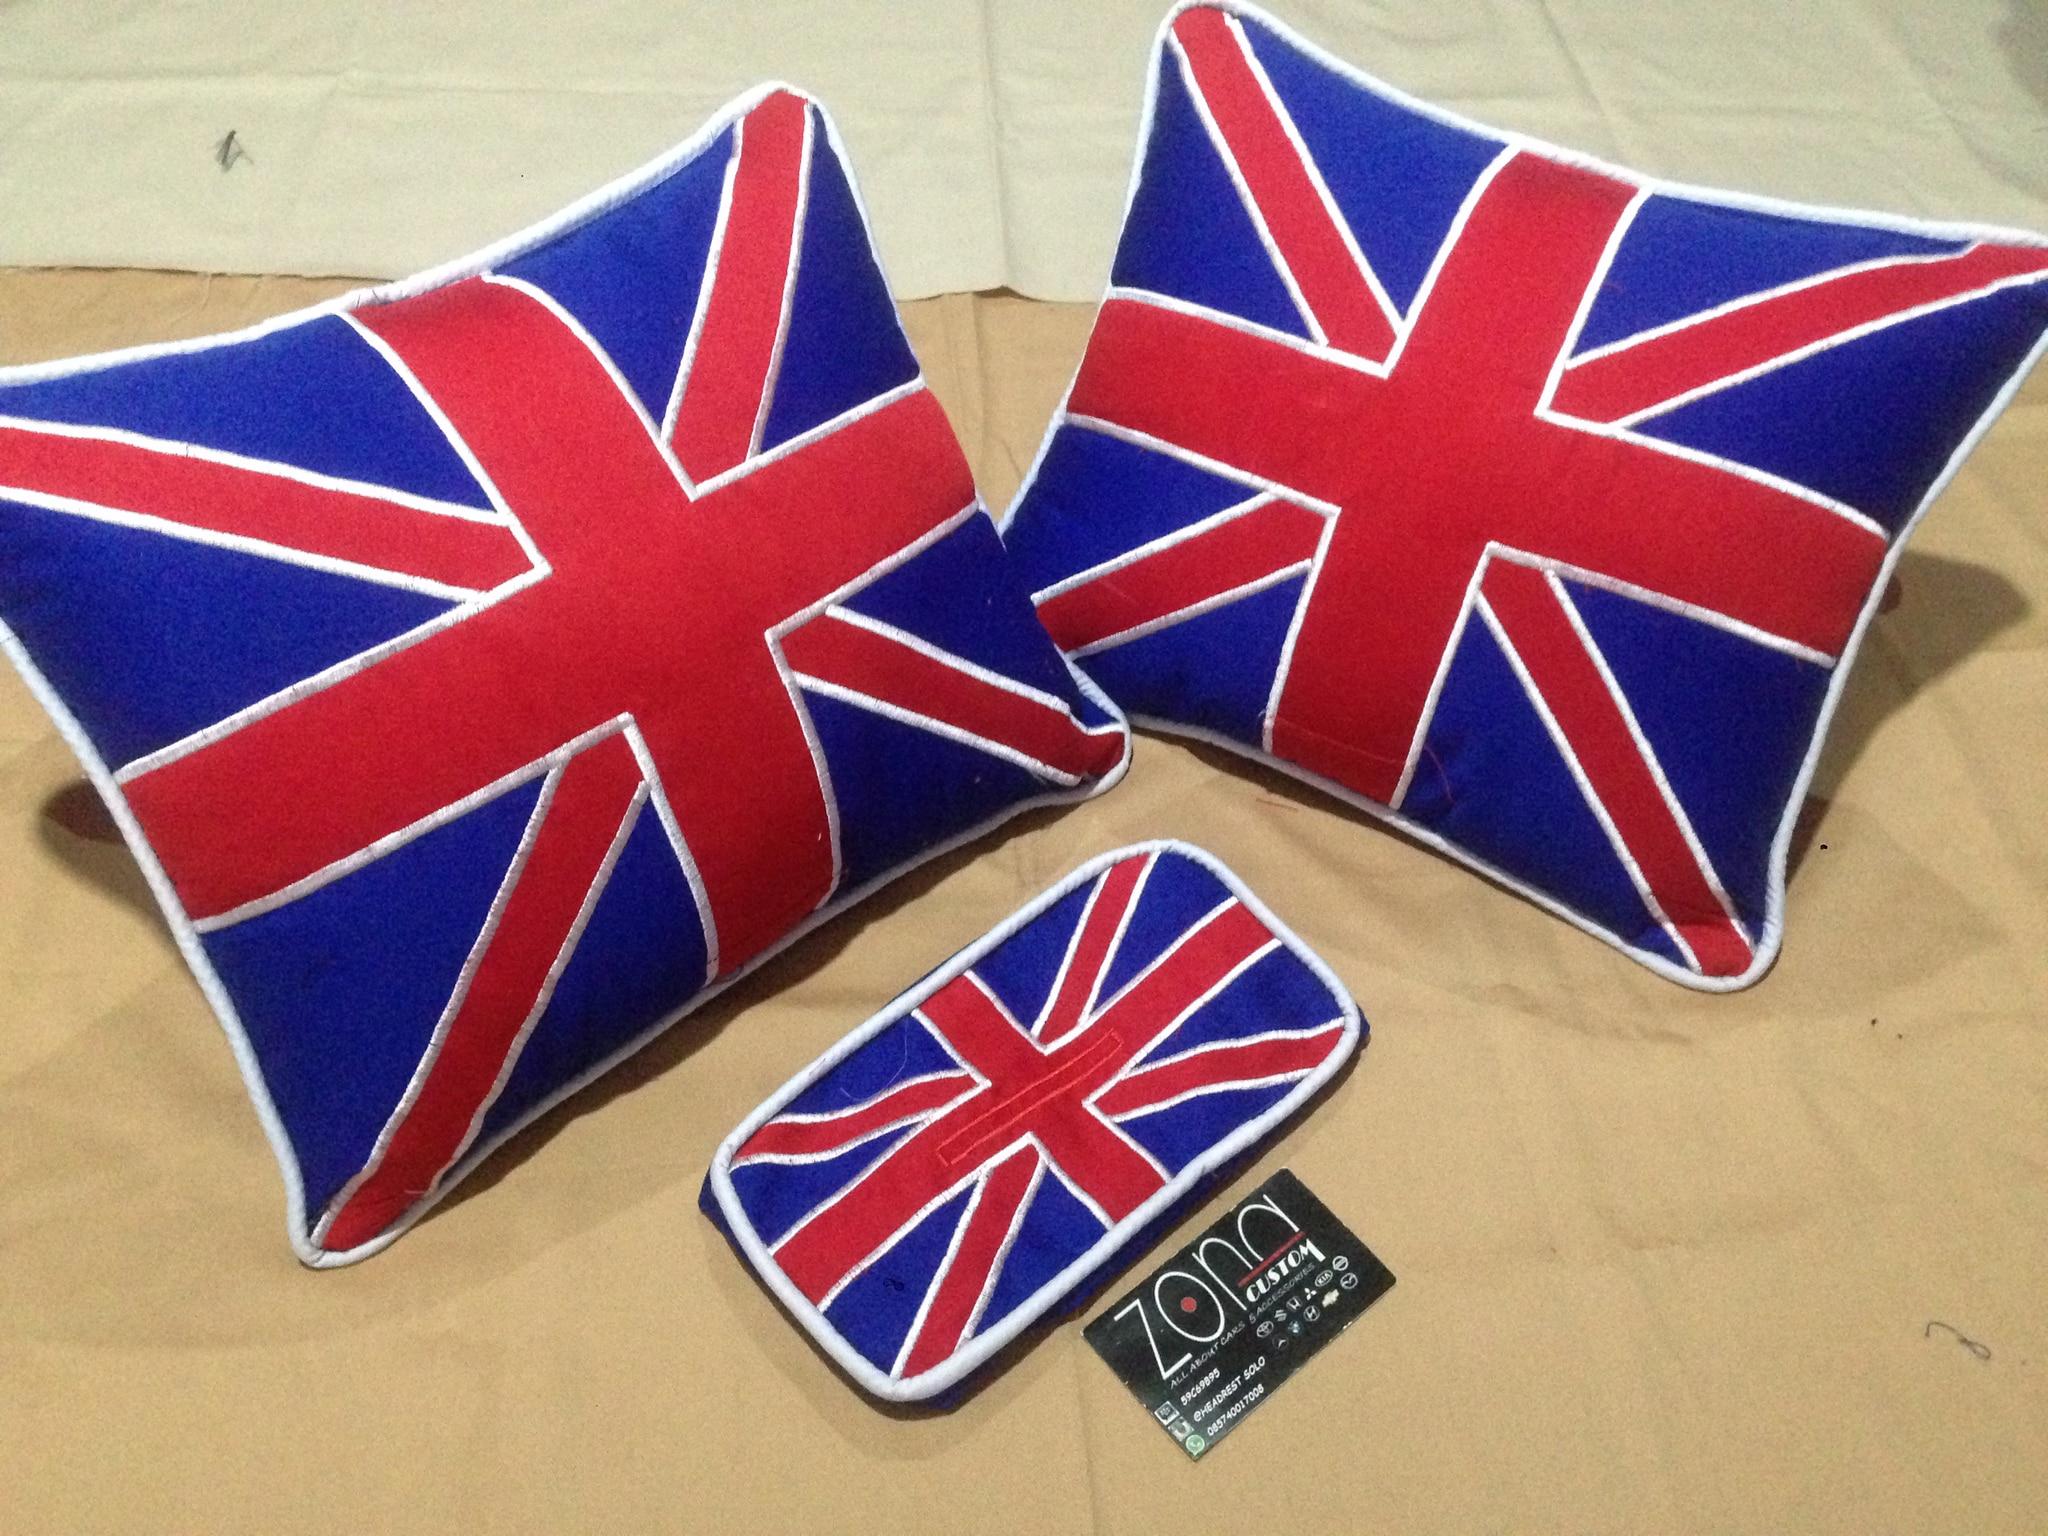 Jual Bantal Bendera Inggris England Sofa Murah Leher